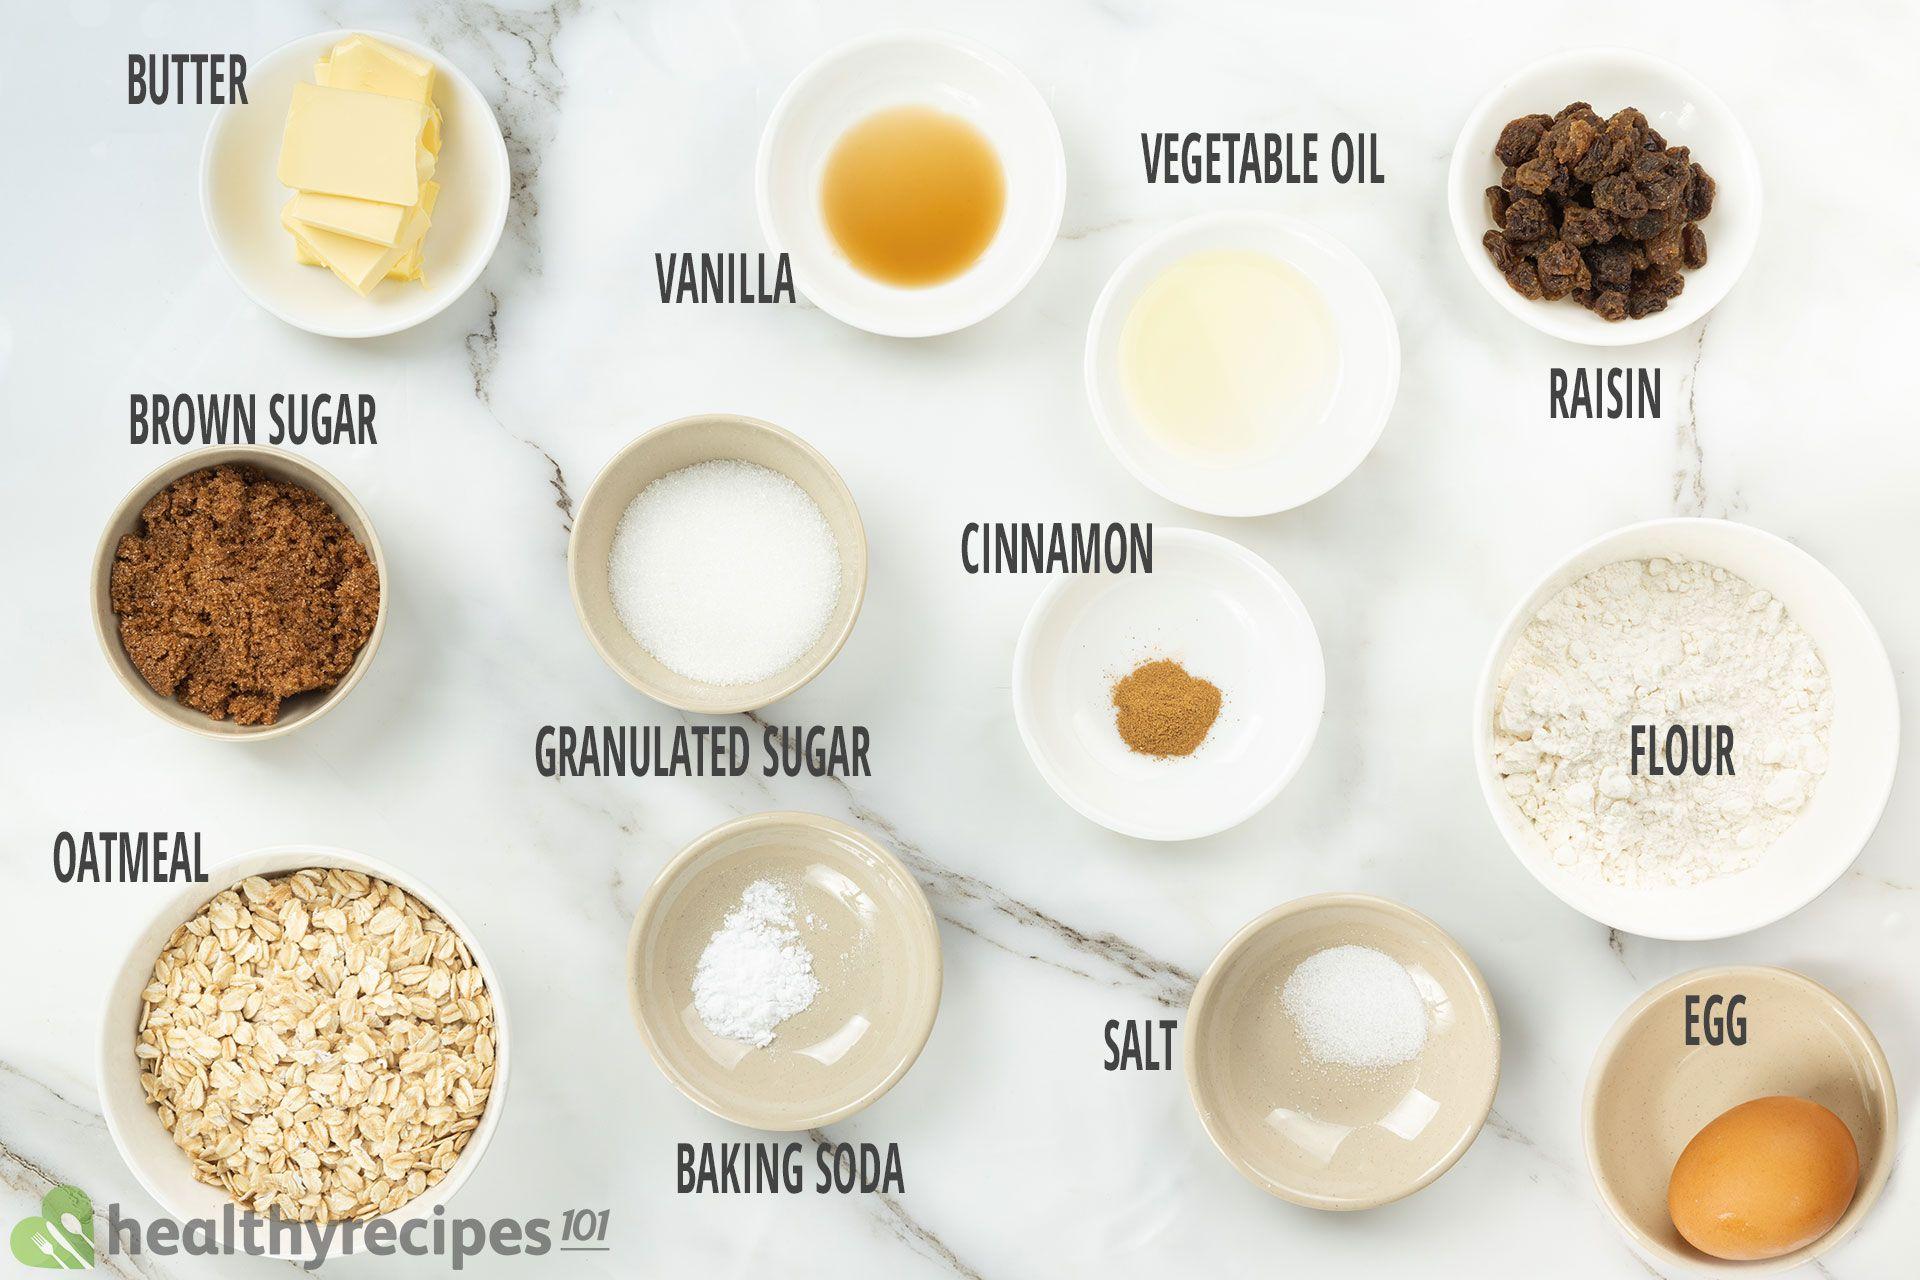 ingredients  for Oatmeal Raisin Cookies